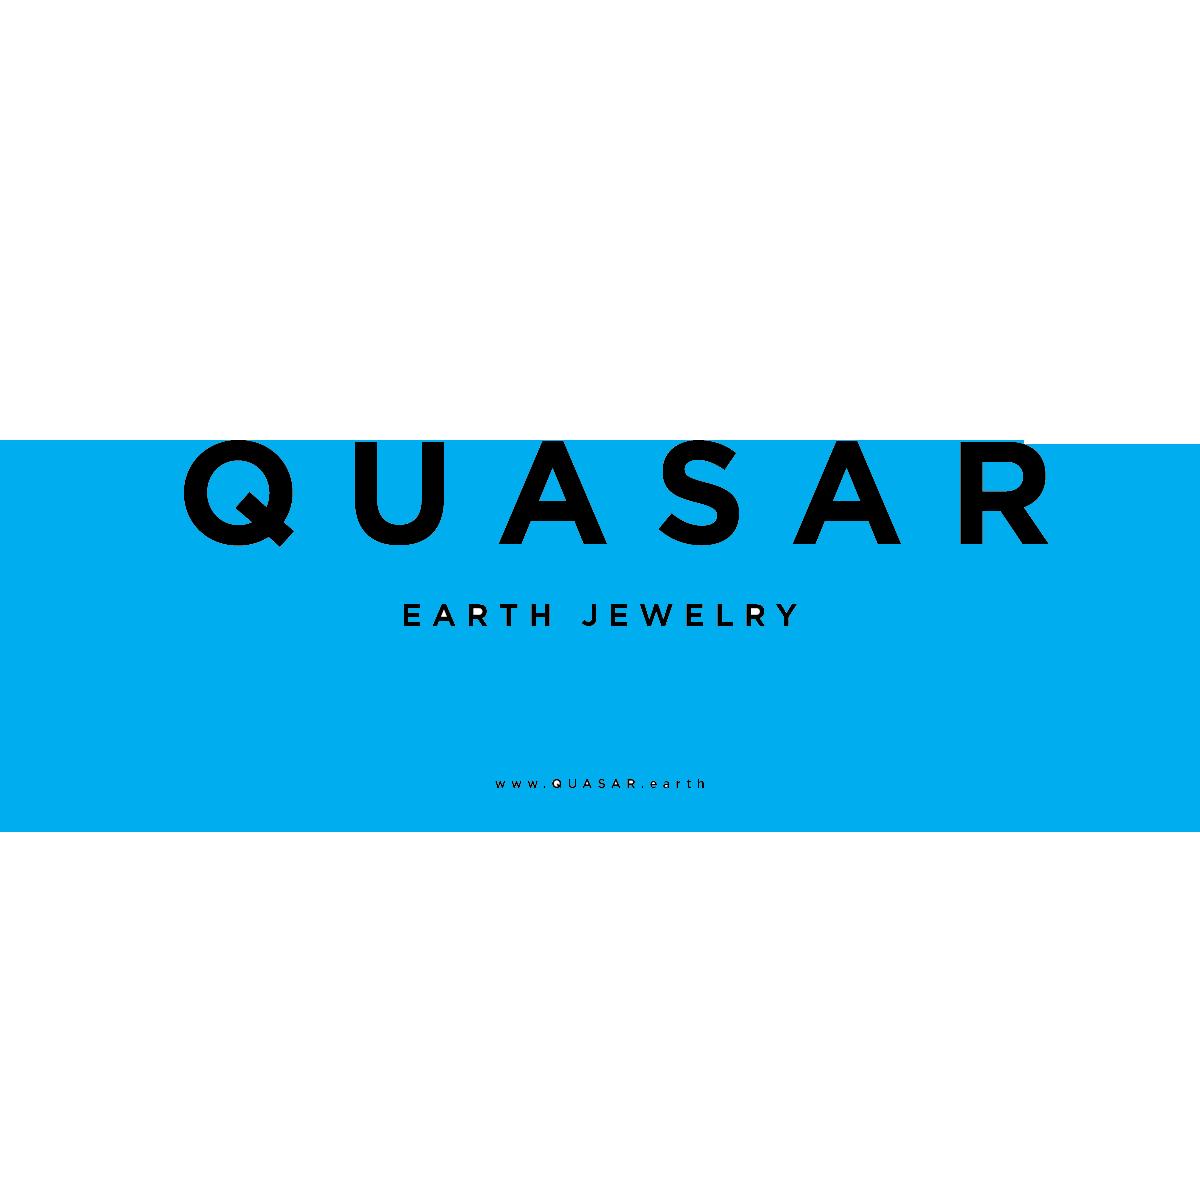 Quasar Earth Jewelry